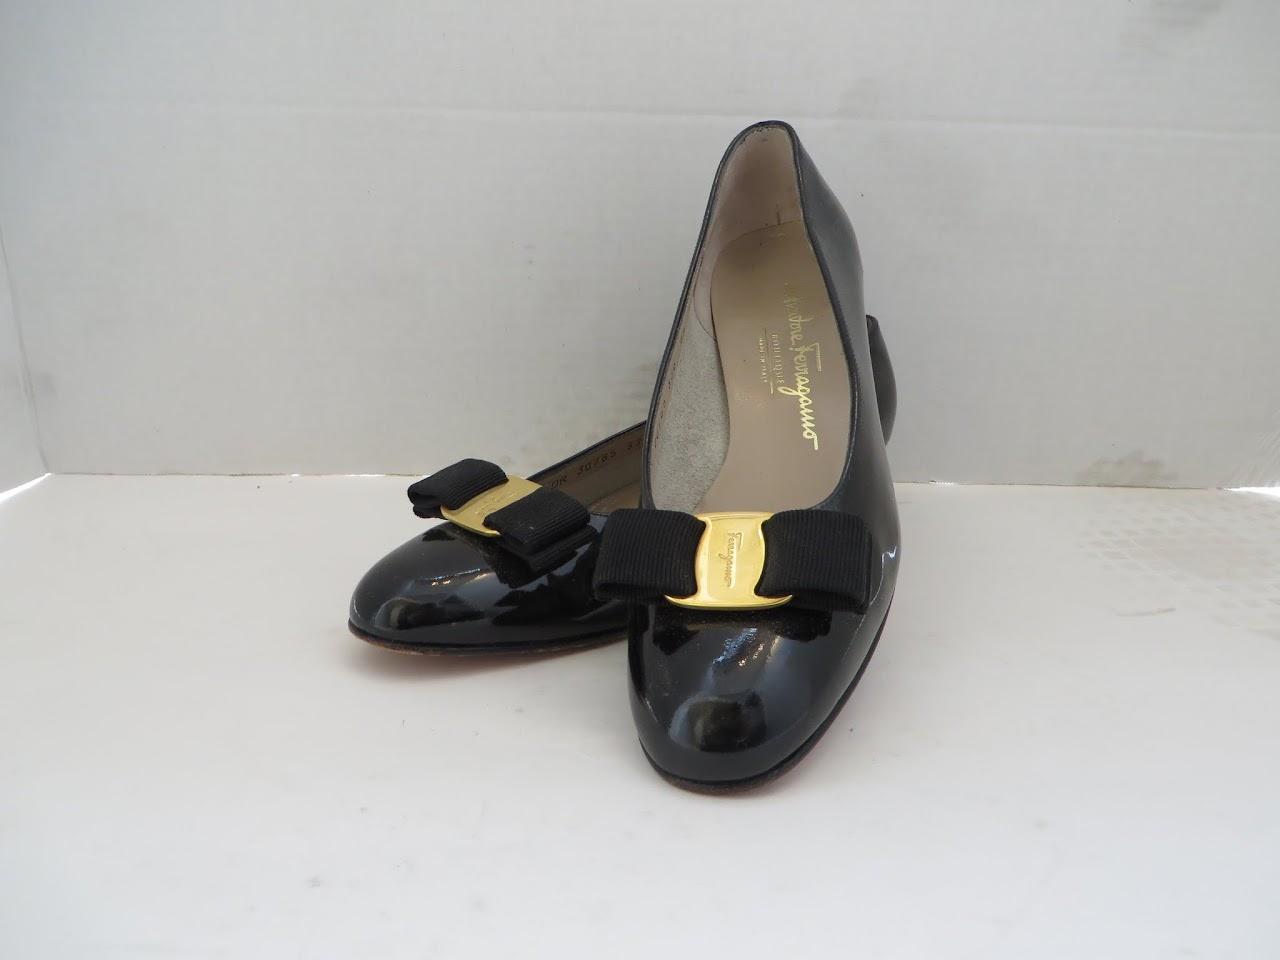 Salvatore Ferragamo Patent Bowtie Heels